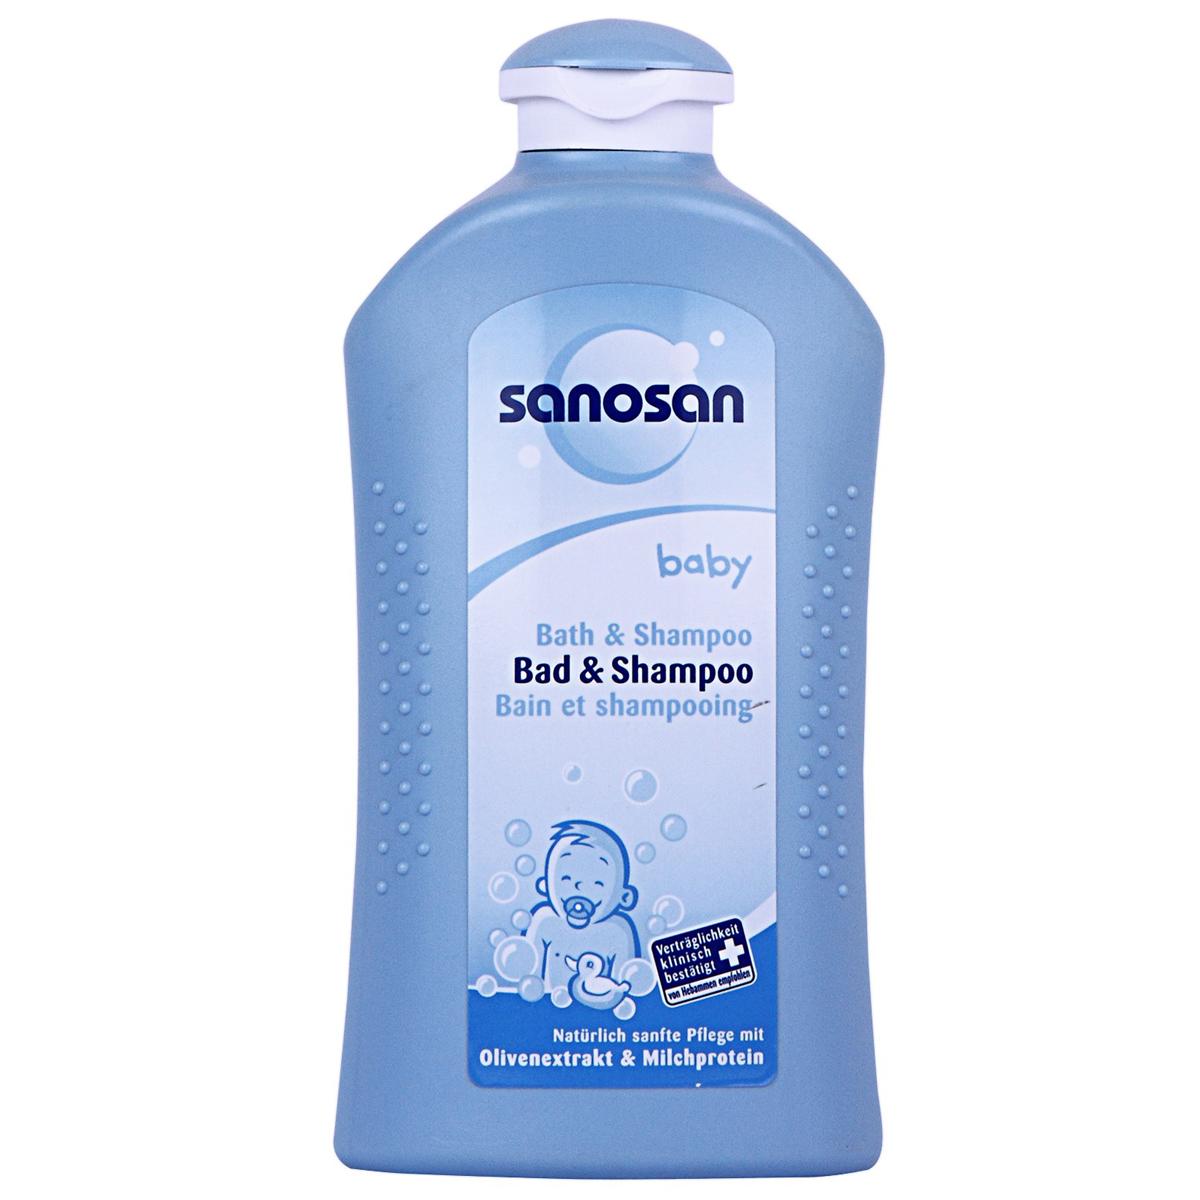 Tam goi cho be Sanosan baby bath & sampoo 500ml